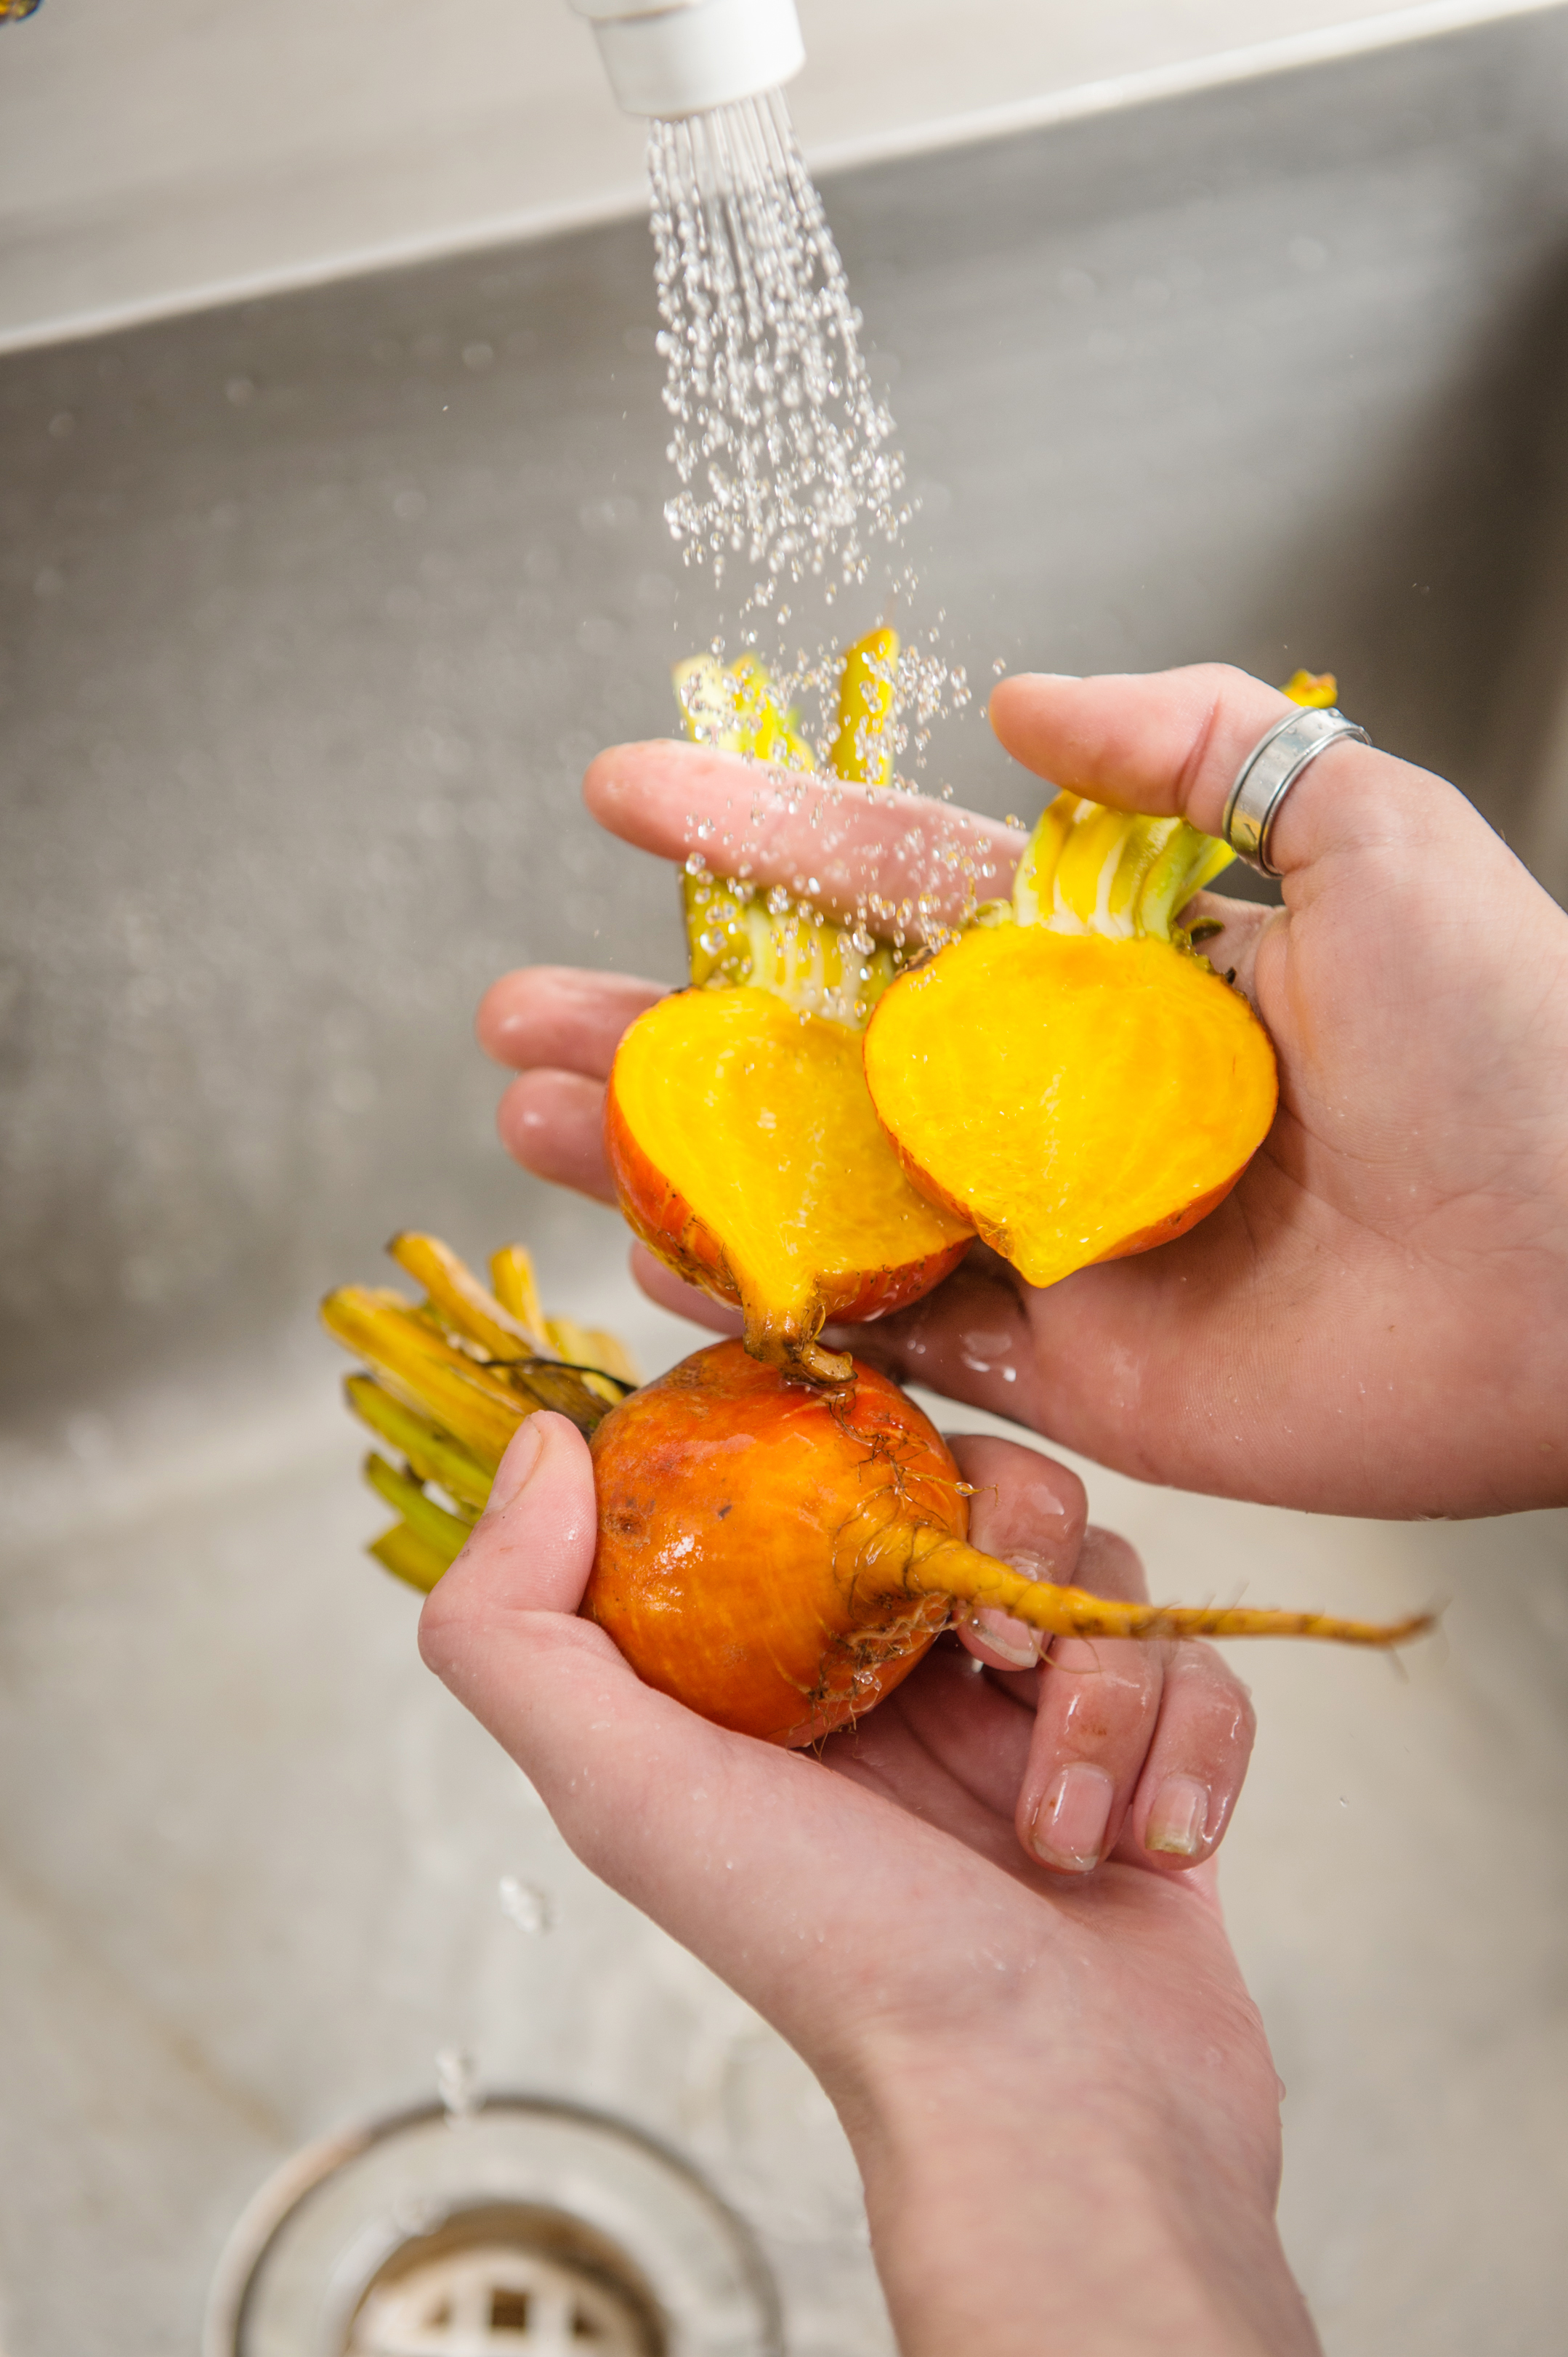 Sanitising Fresh Produce